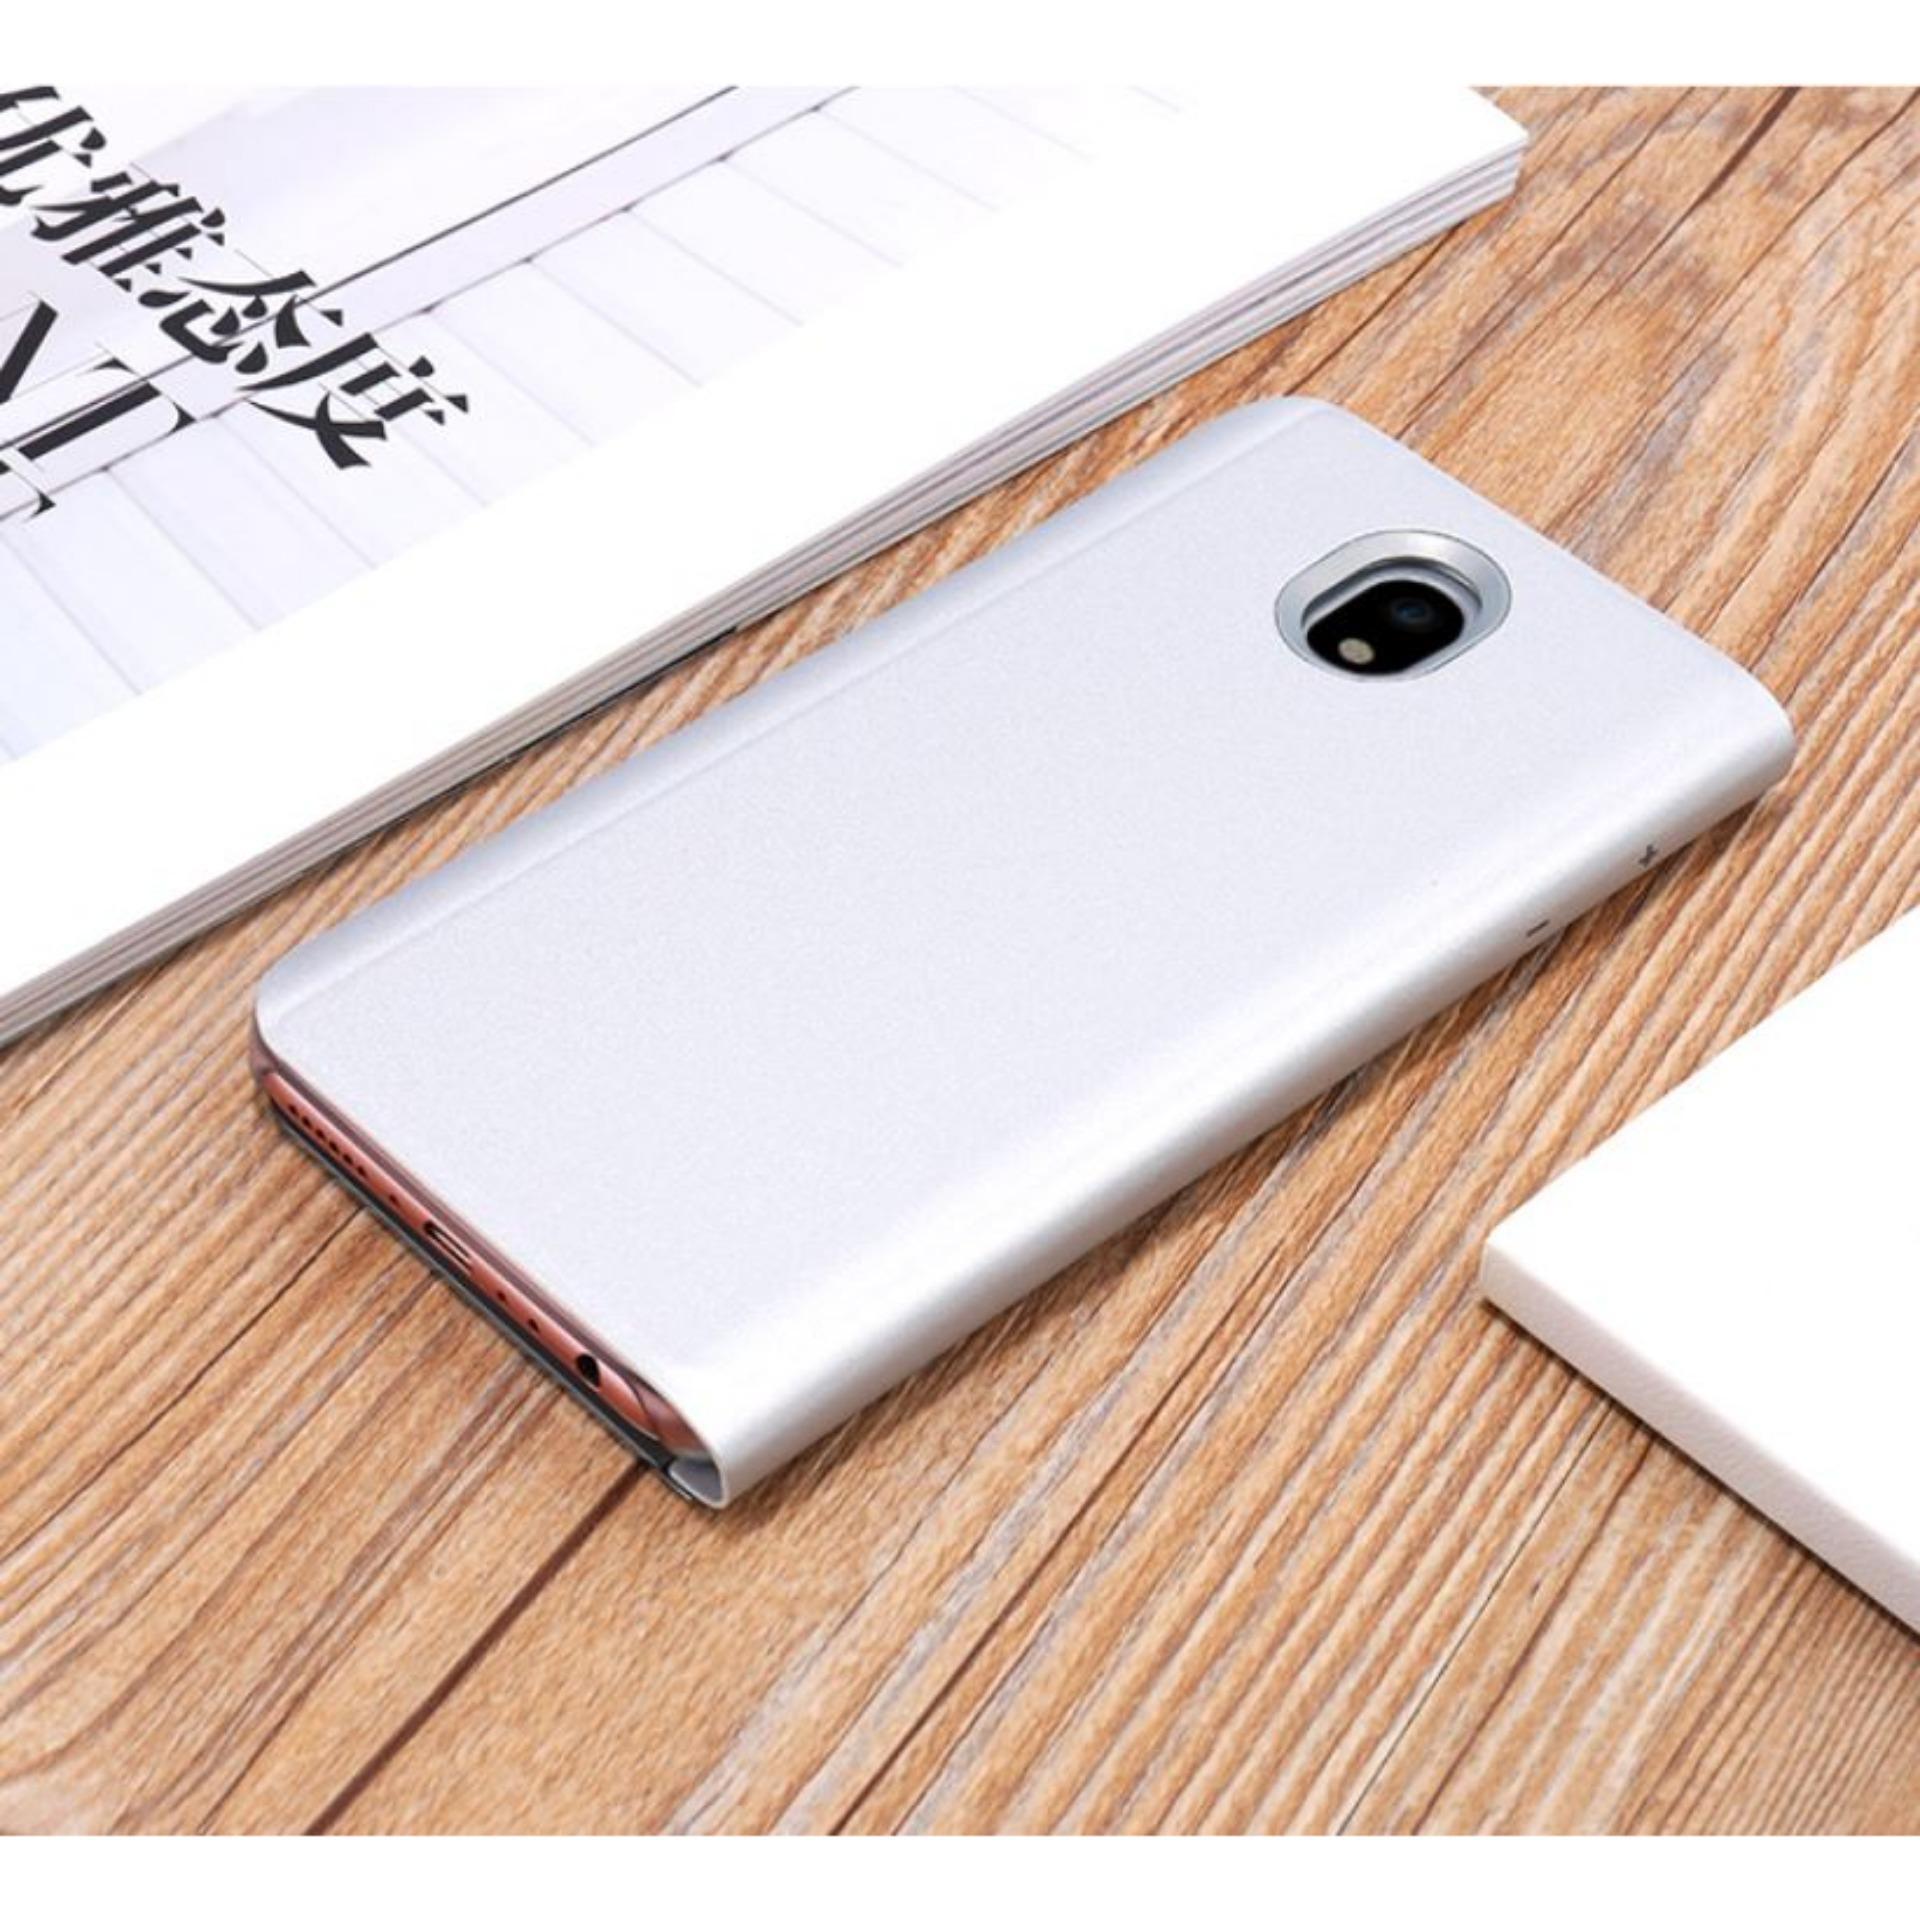 Fitur Aldora Book Cover For Samsung Galaxy J3 Pro Transformers Case Standing Xiaomi Redmi Note 4 Biru J330 Hardcase Clear View Stand